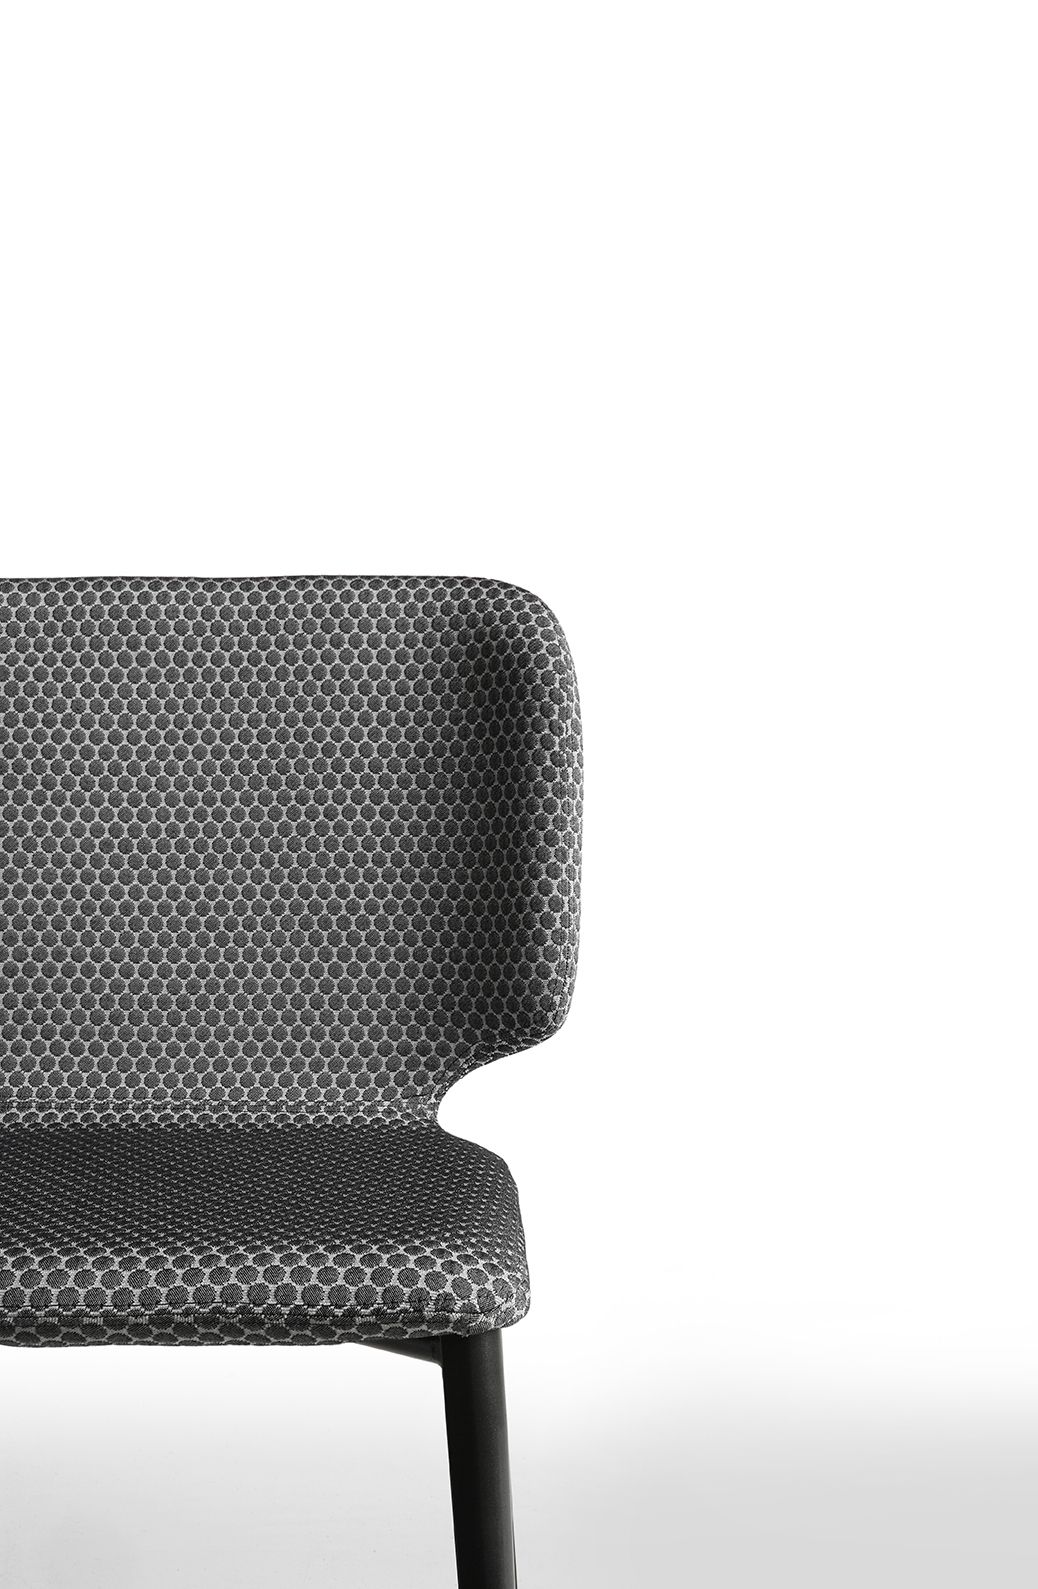 Amazing Wrap Chair By Midj In Italy. Design Studio Balutto Associati.